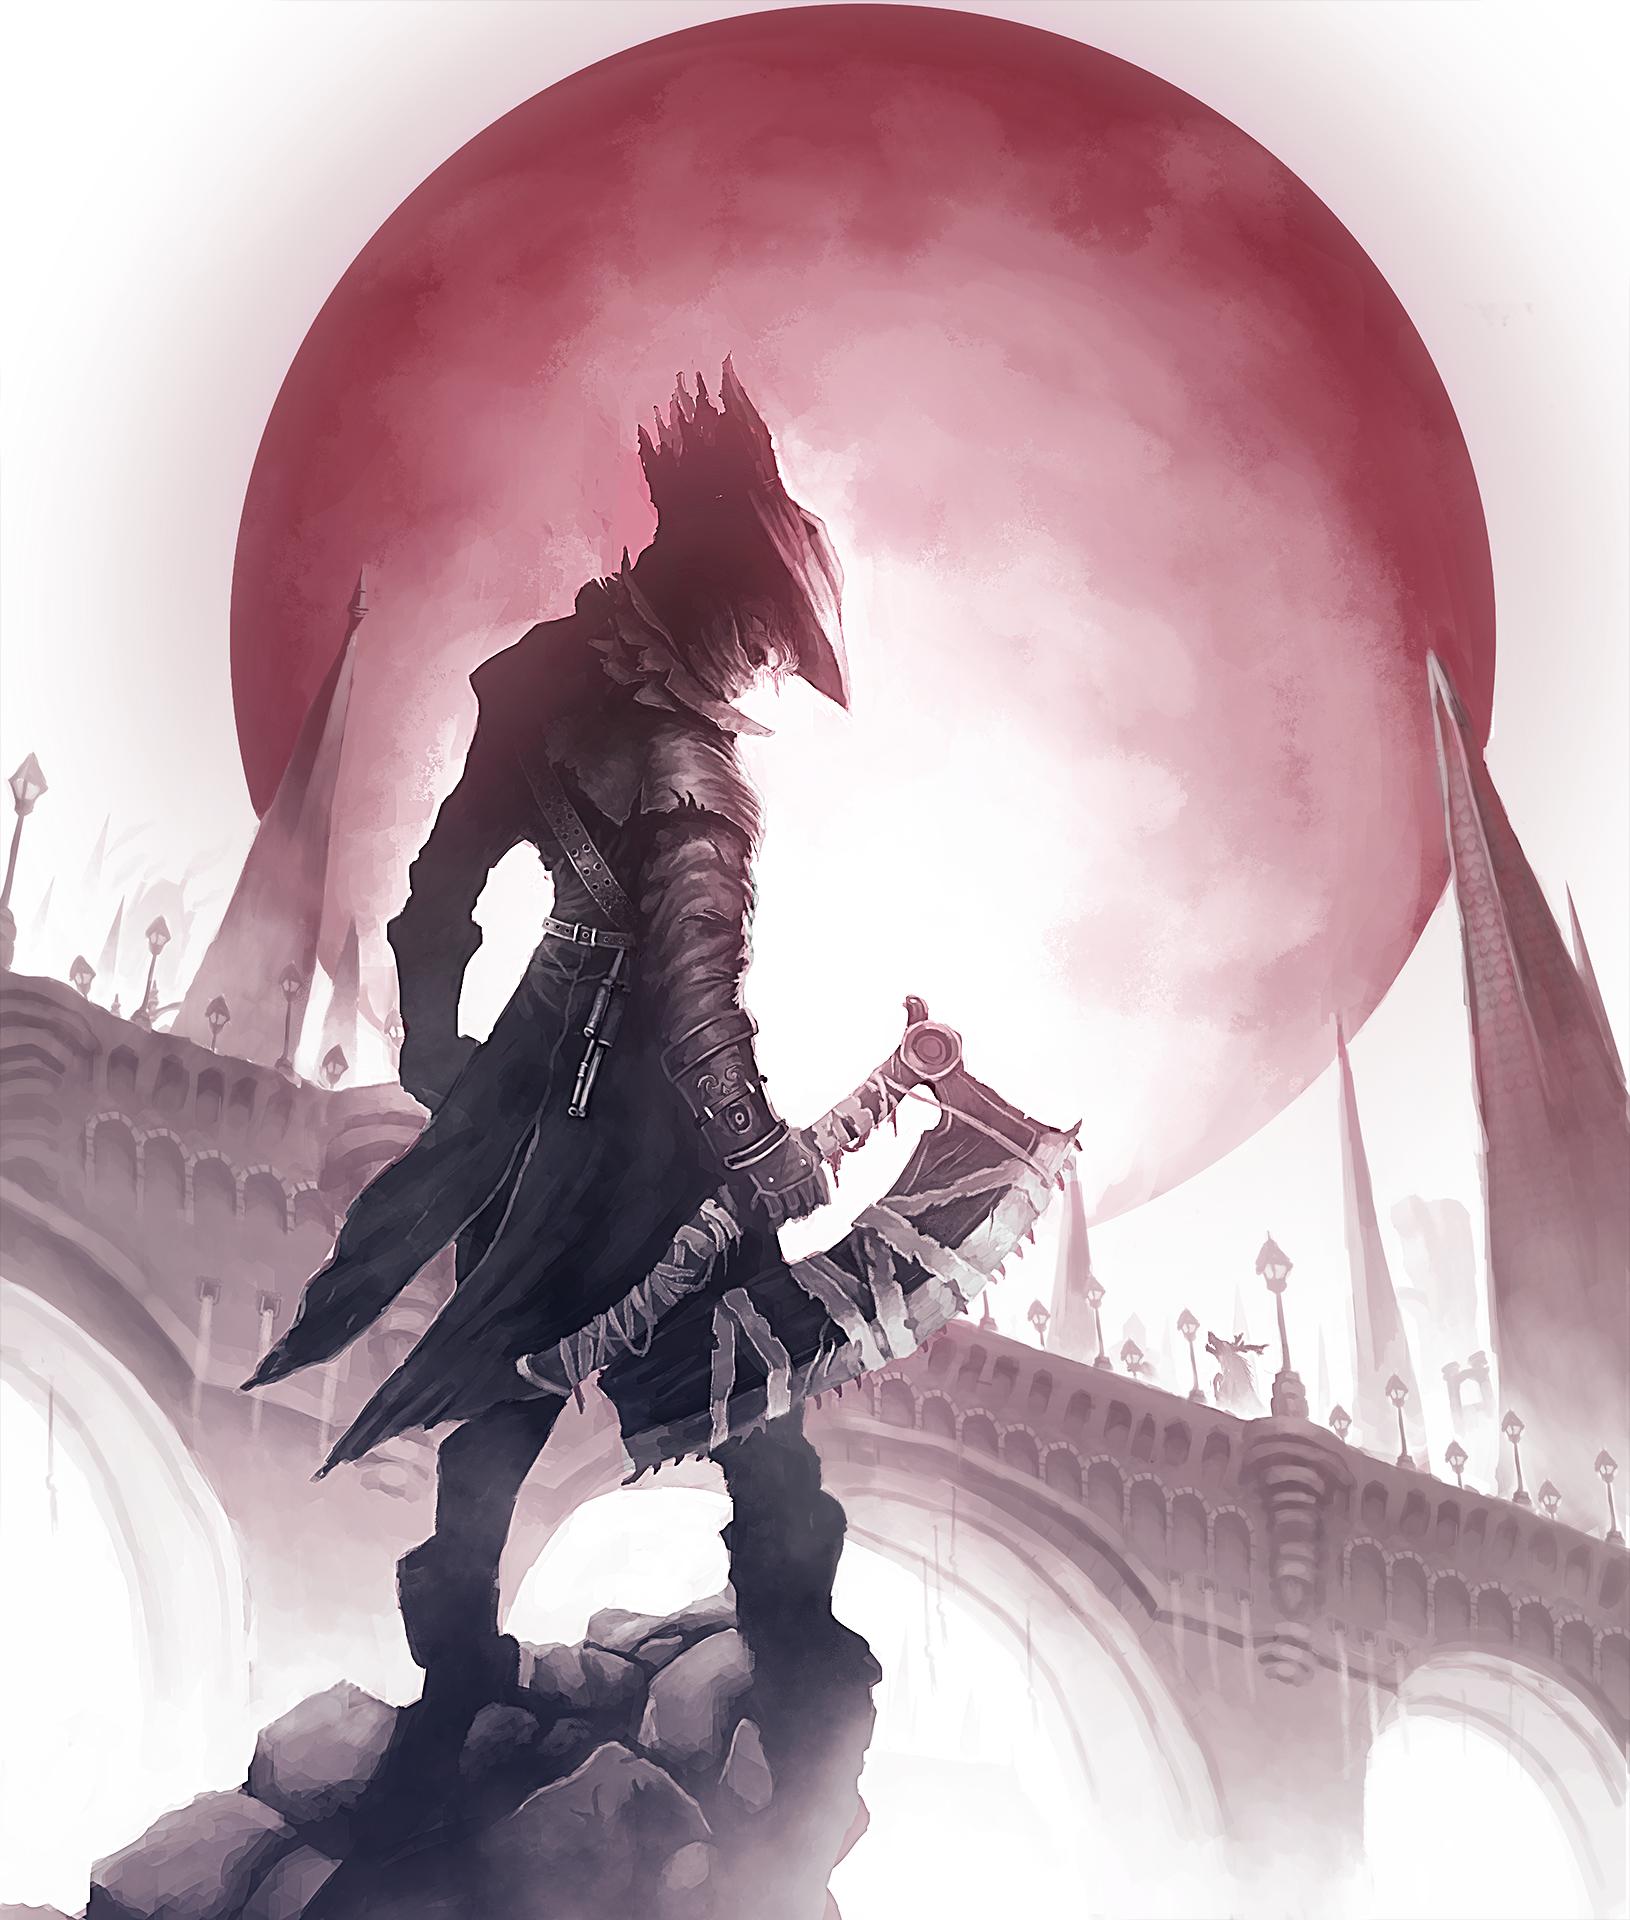 The Paleblood hunter